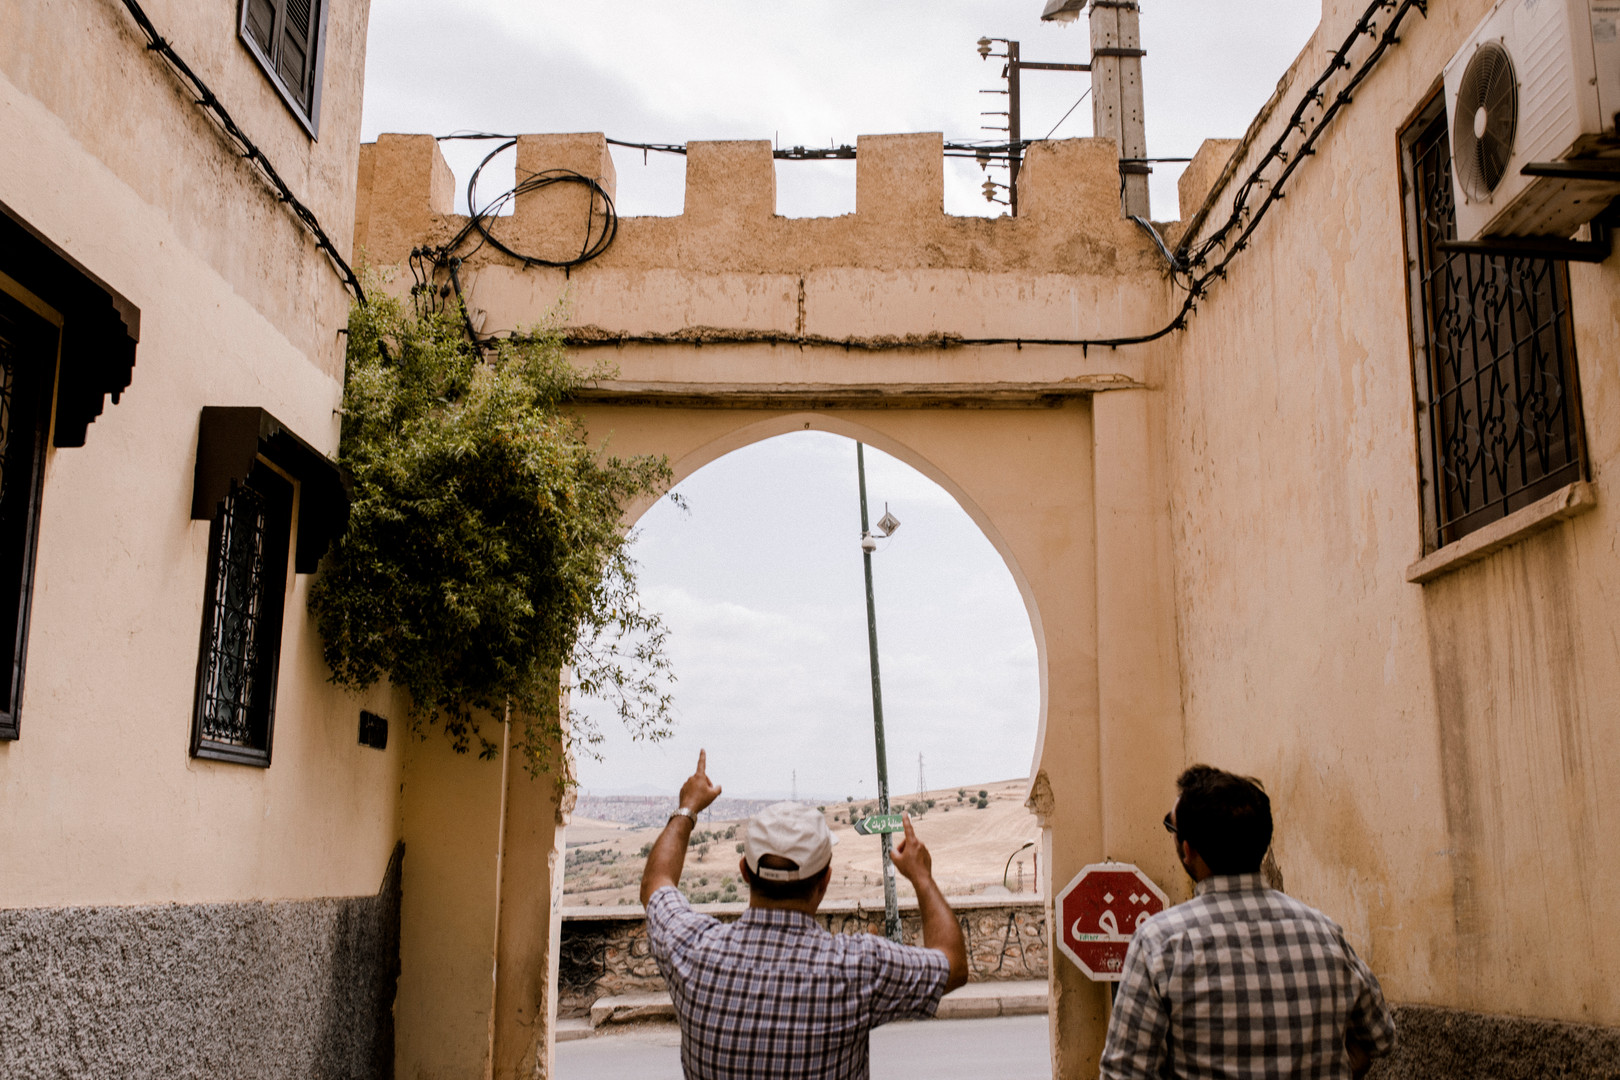 Morocco-32.jpg